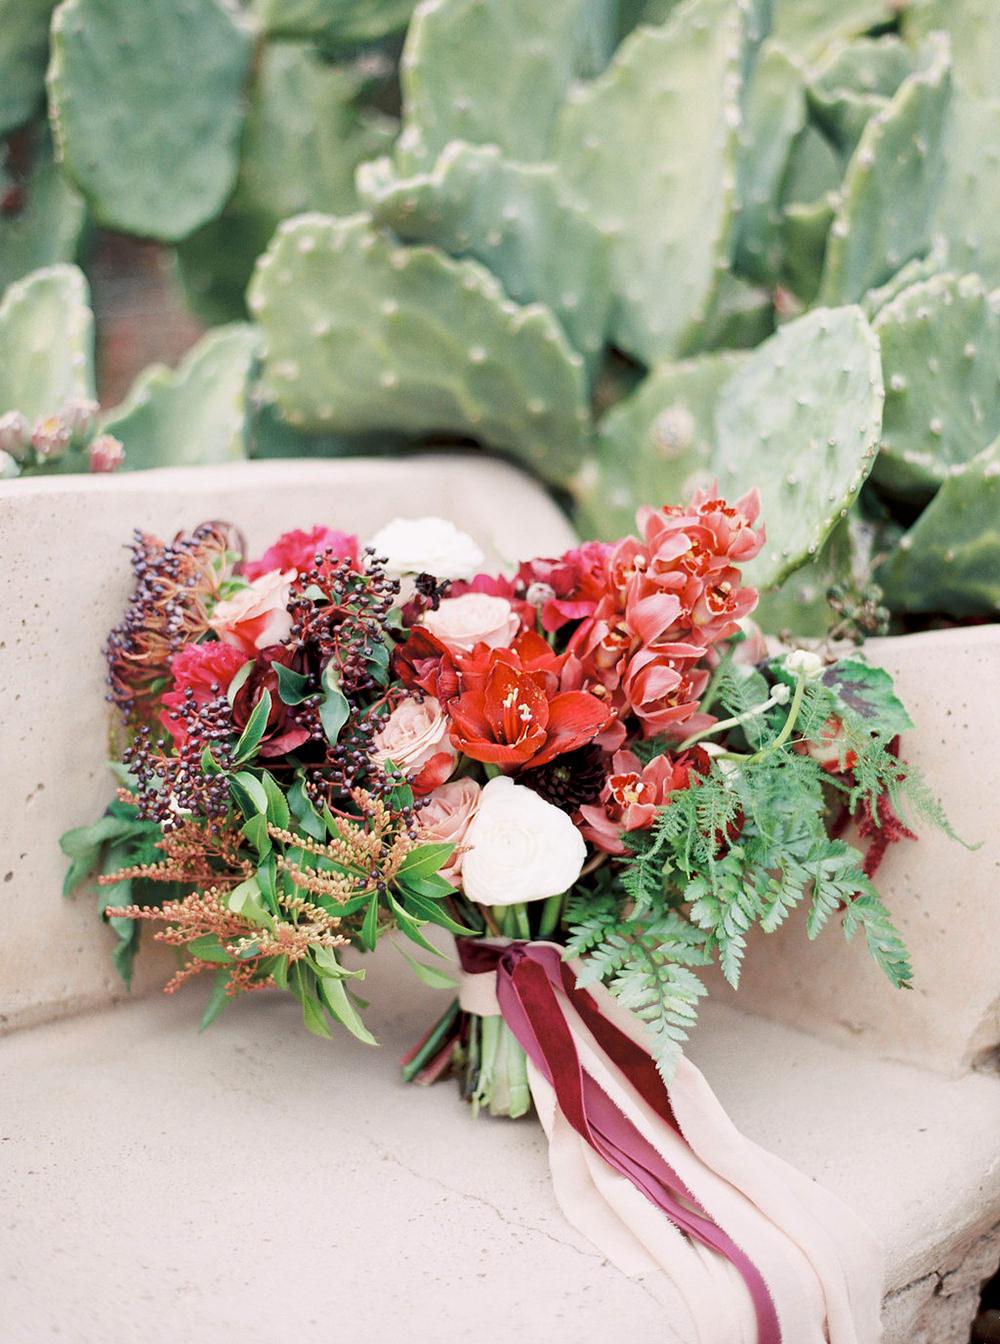 romantic wedding bouquets - photo by Amanda Lenhardt http://ruffledblog.com/relaxed-san-juan-capistrano-wedding-inspiration